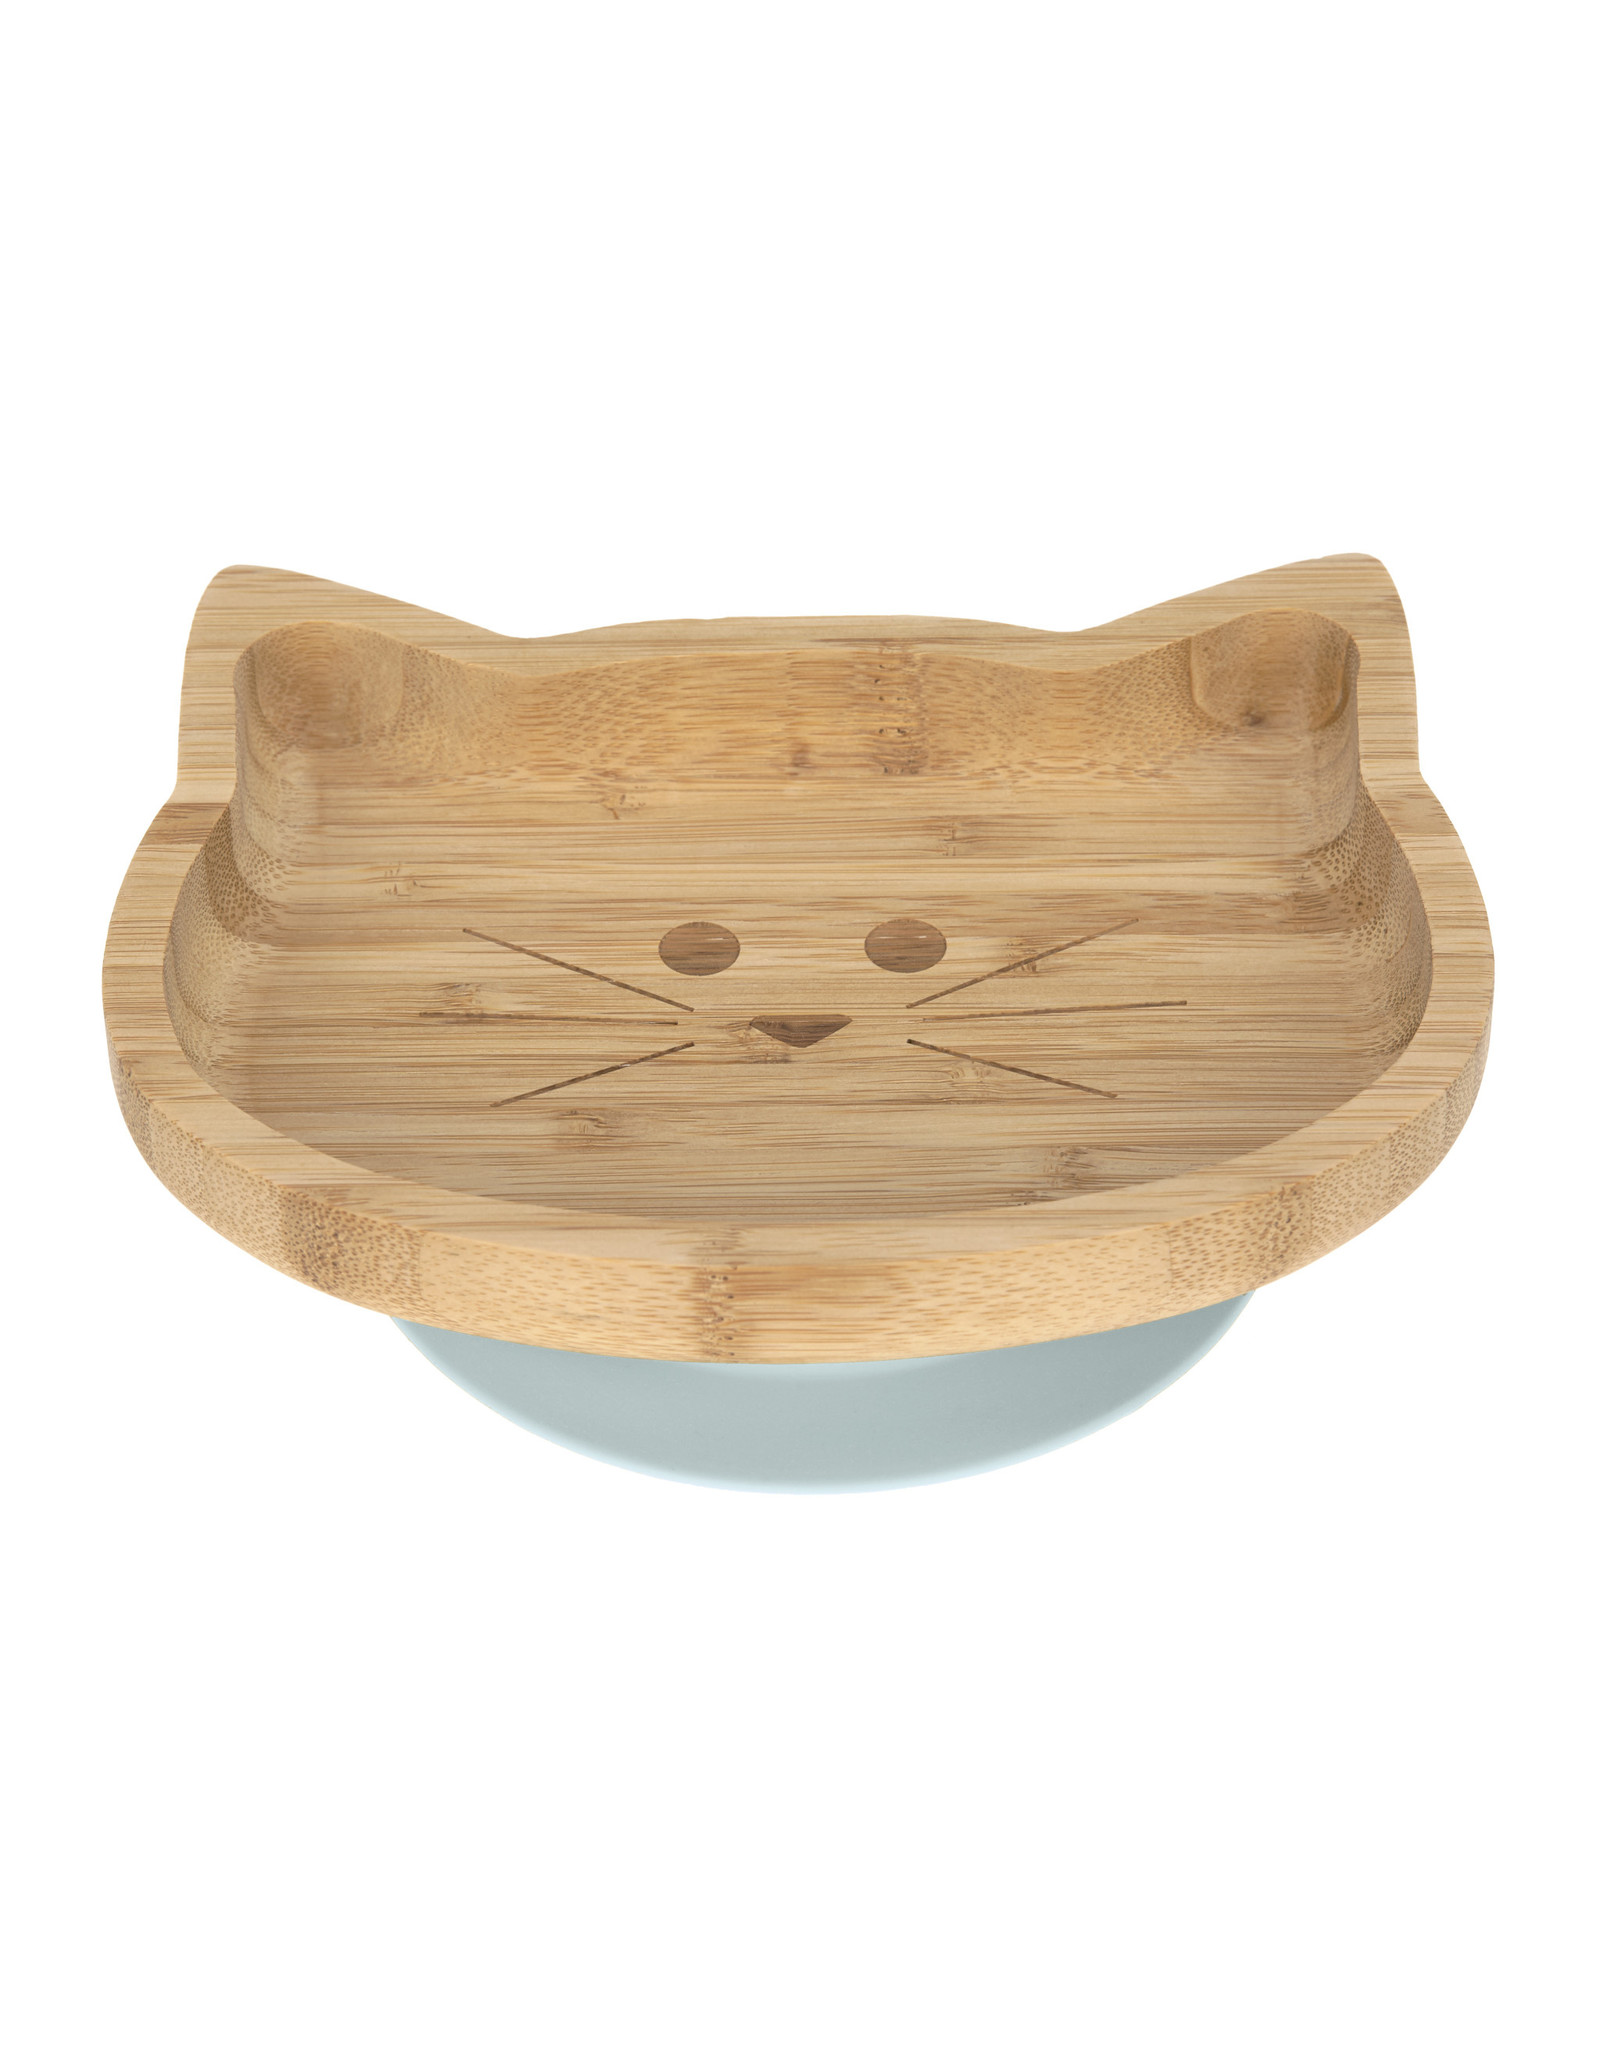 Lassig Lassig Platter Bamboo - Wood Little Chums Cat